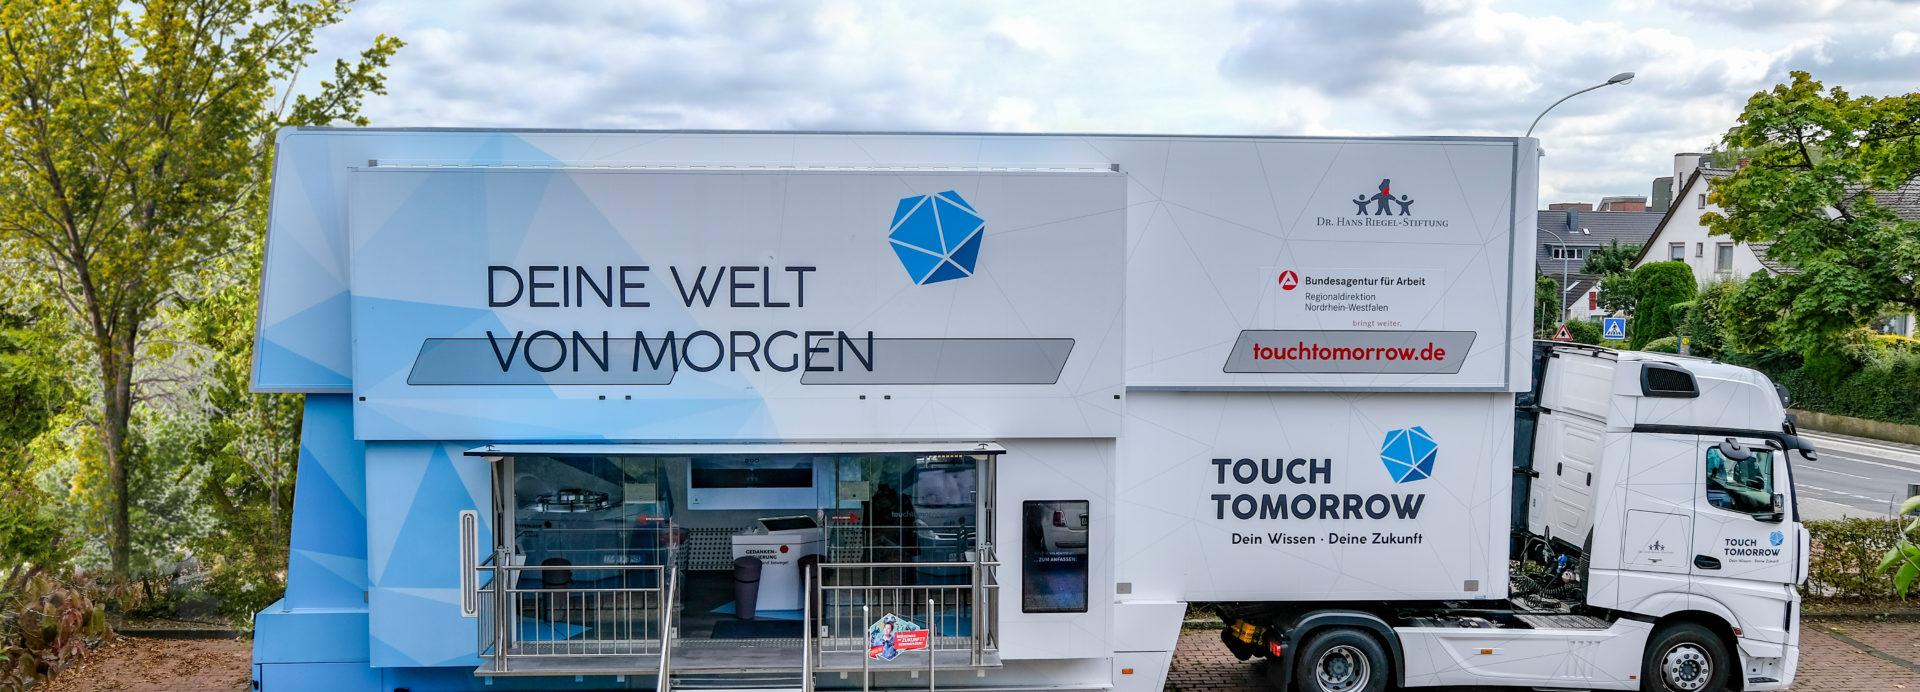 TouchTomorrow-Truck kommt (27.11. – 03.12.2020)